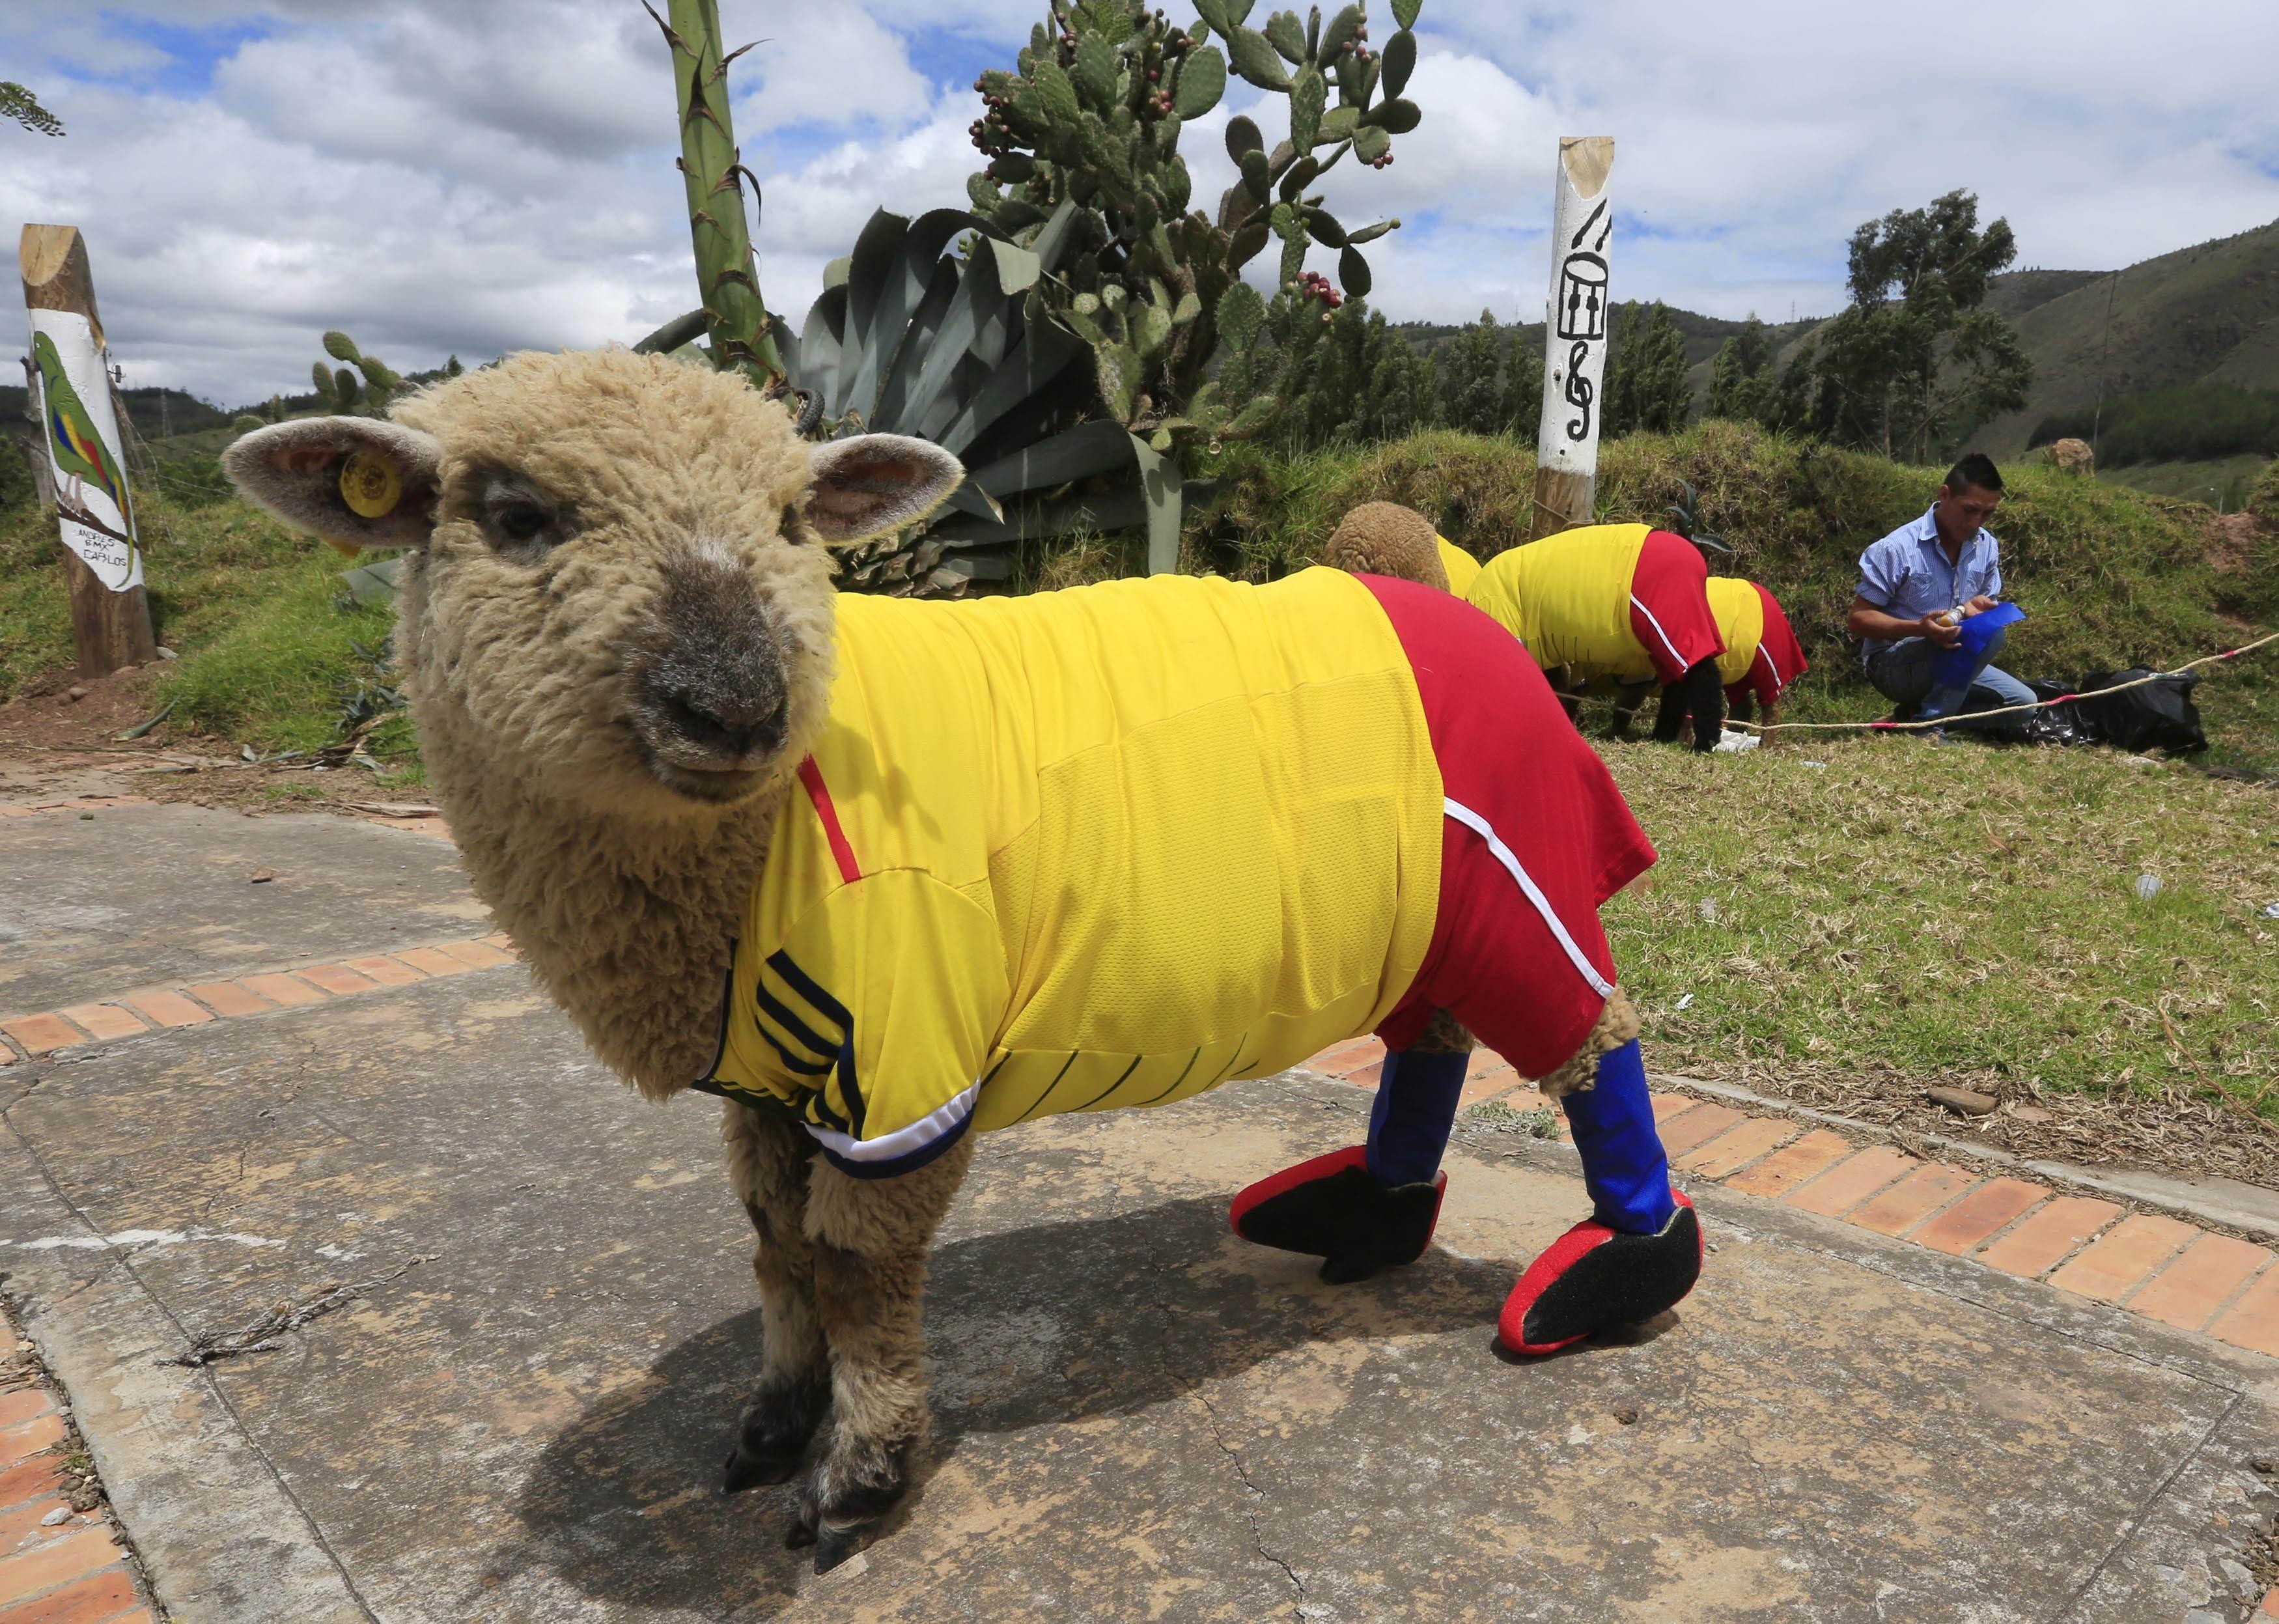 Sheep world cup hoofs off ahead of World Cup 2014